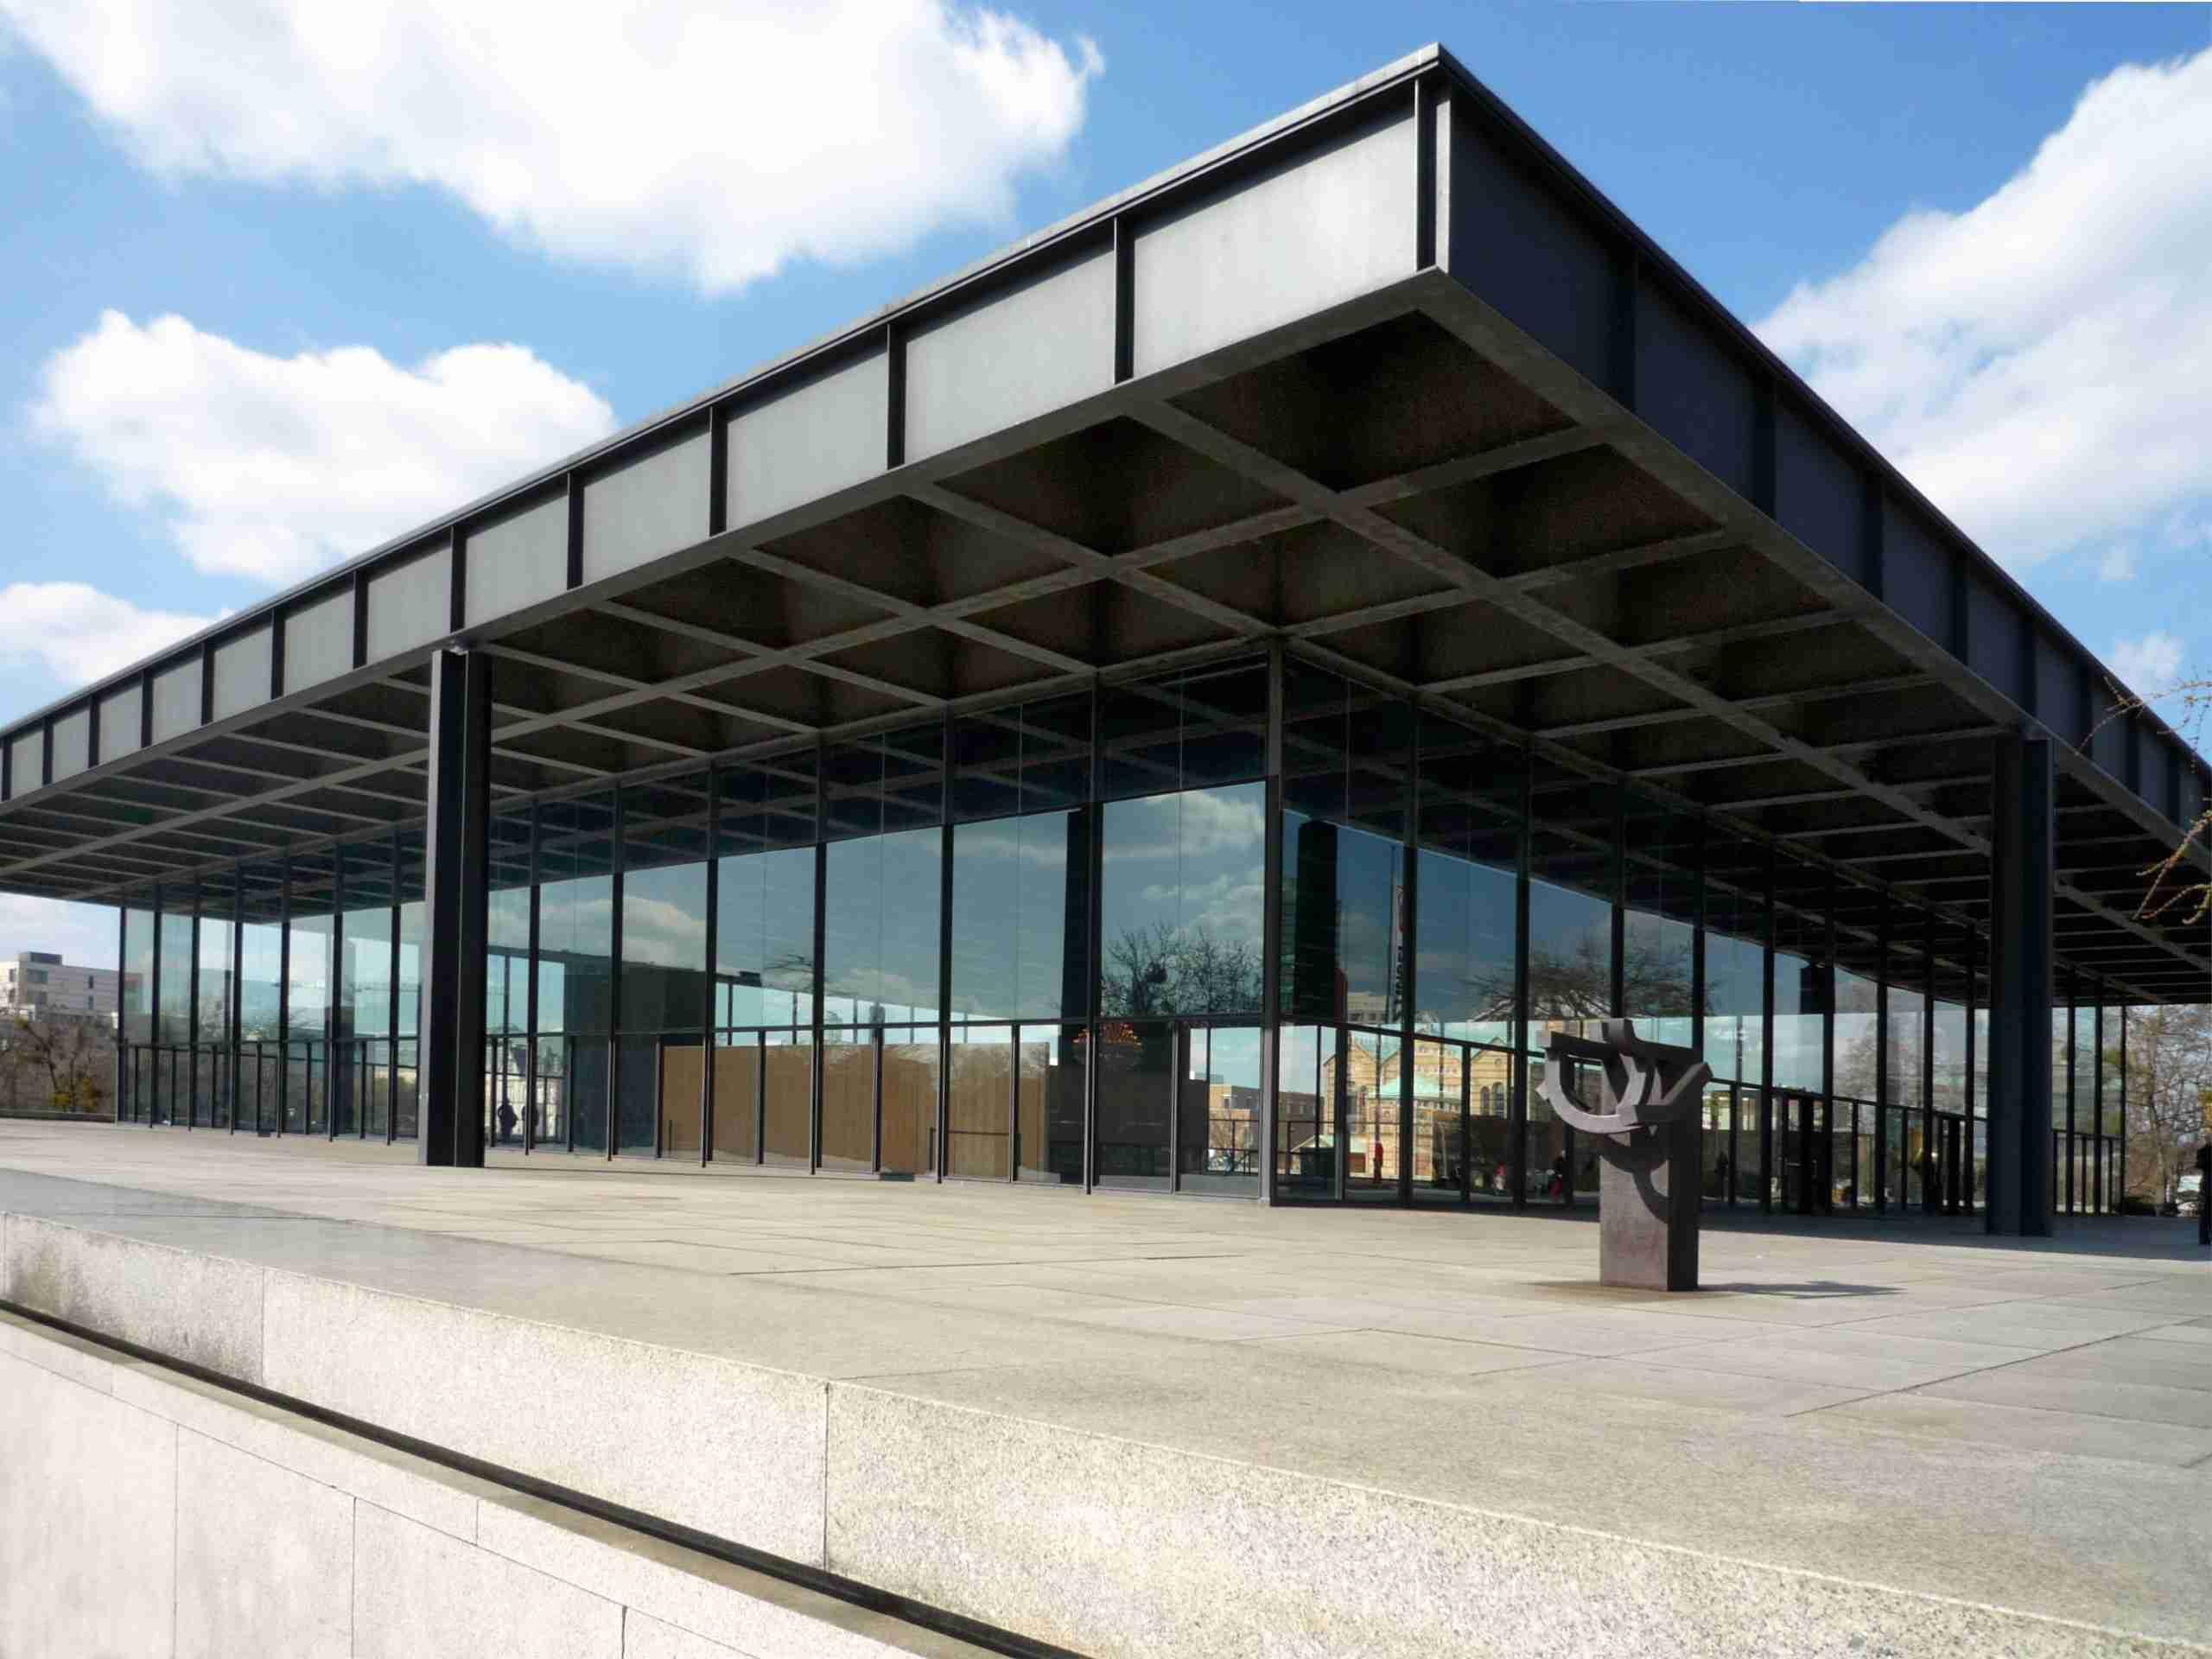 New National Gallery in Berlin